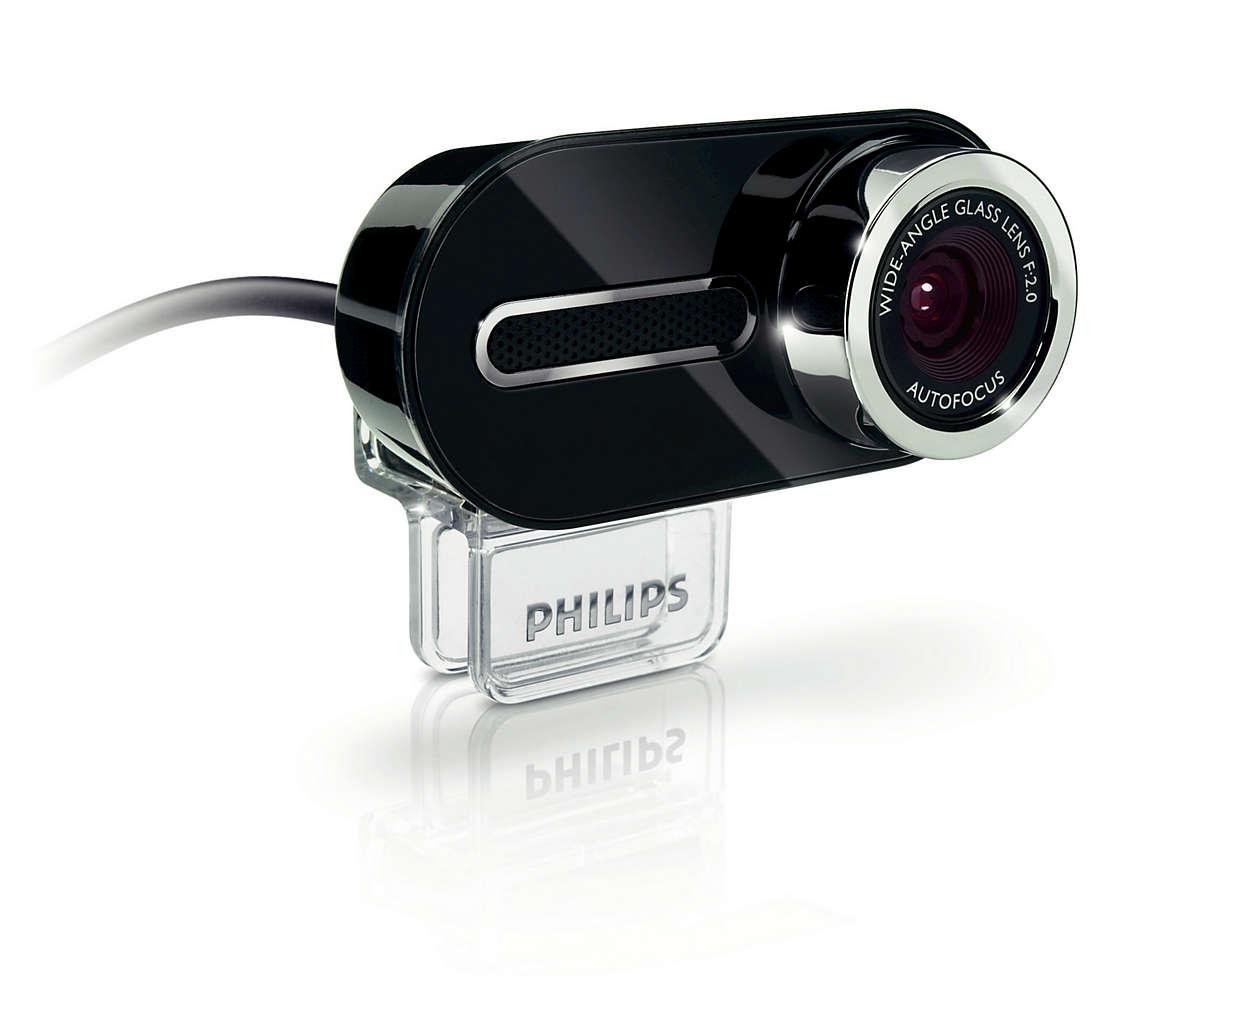 Ditt globale web-kamera